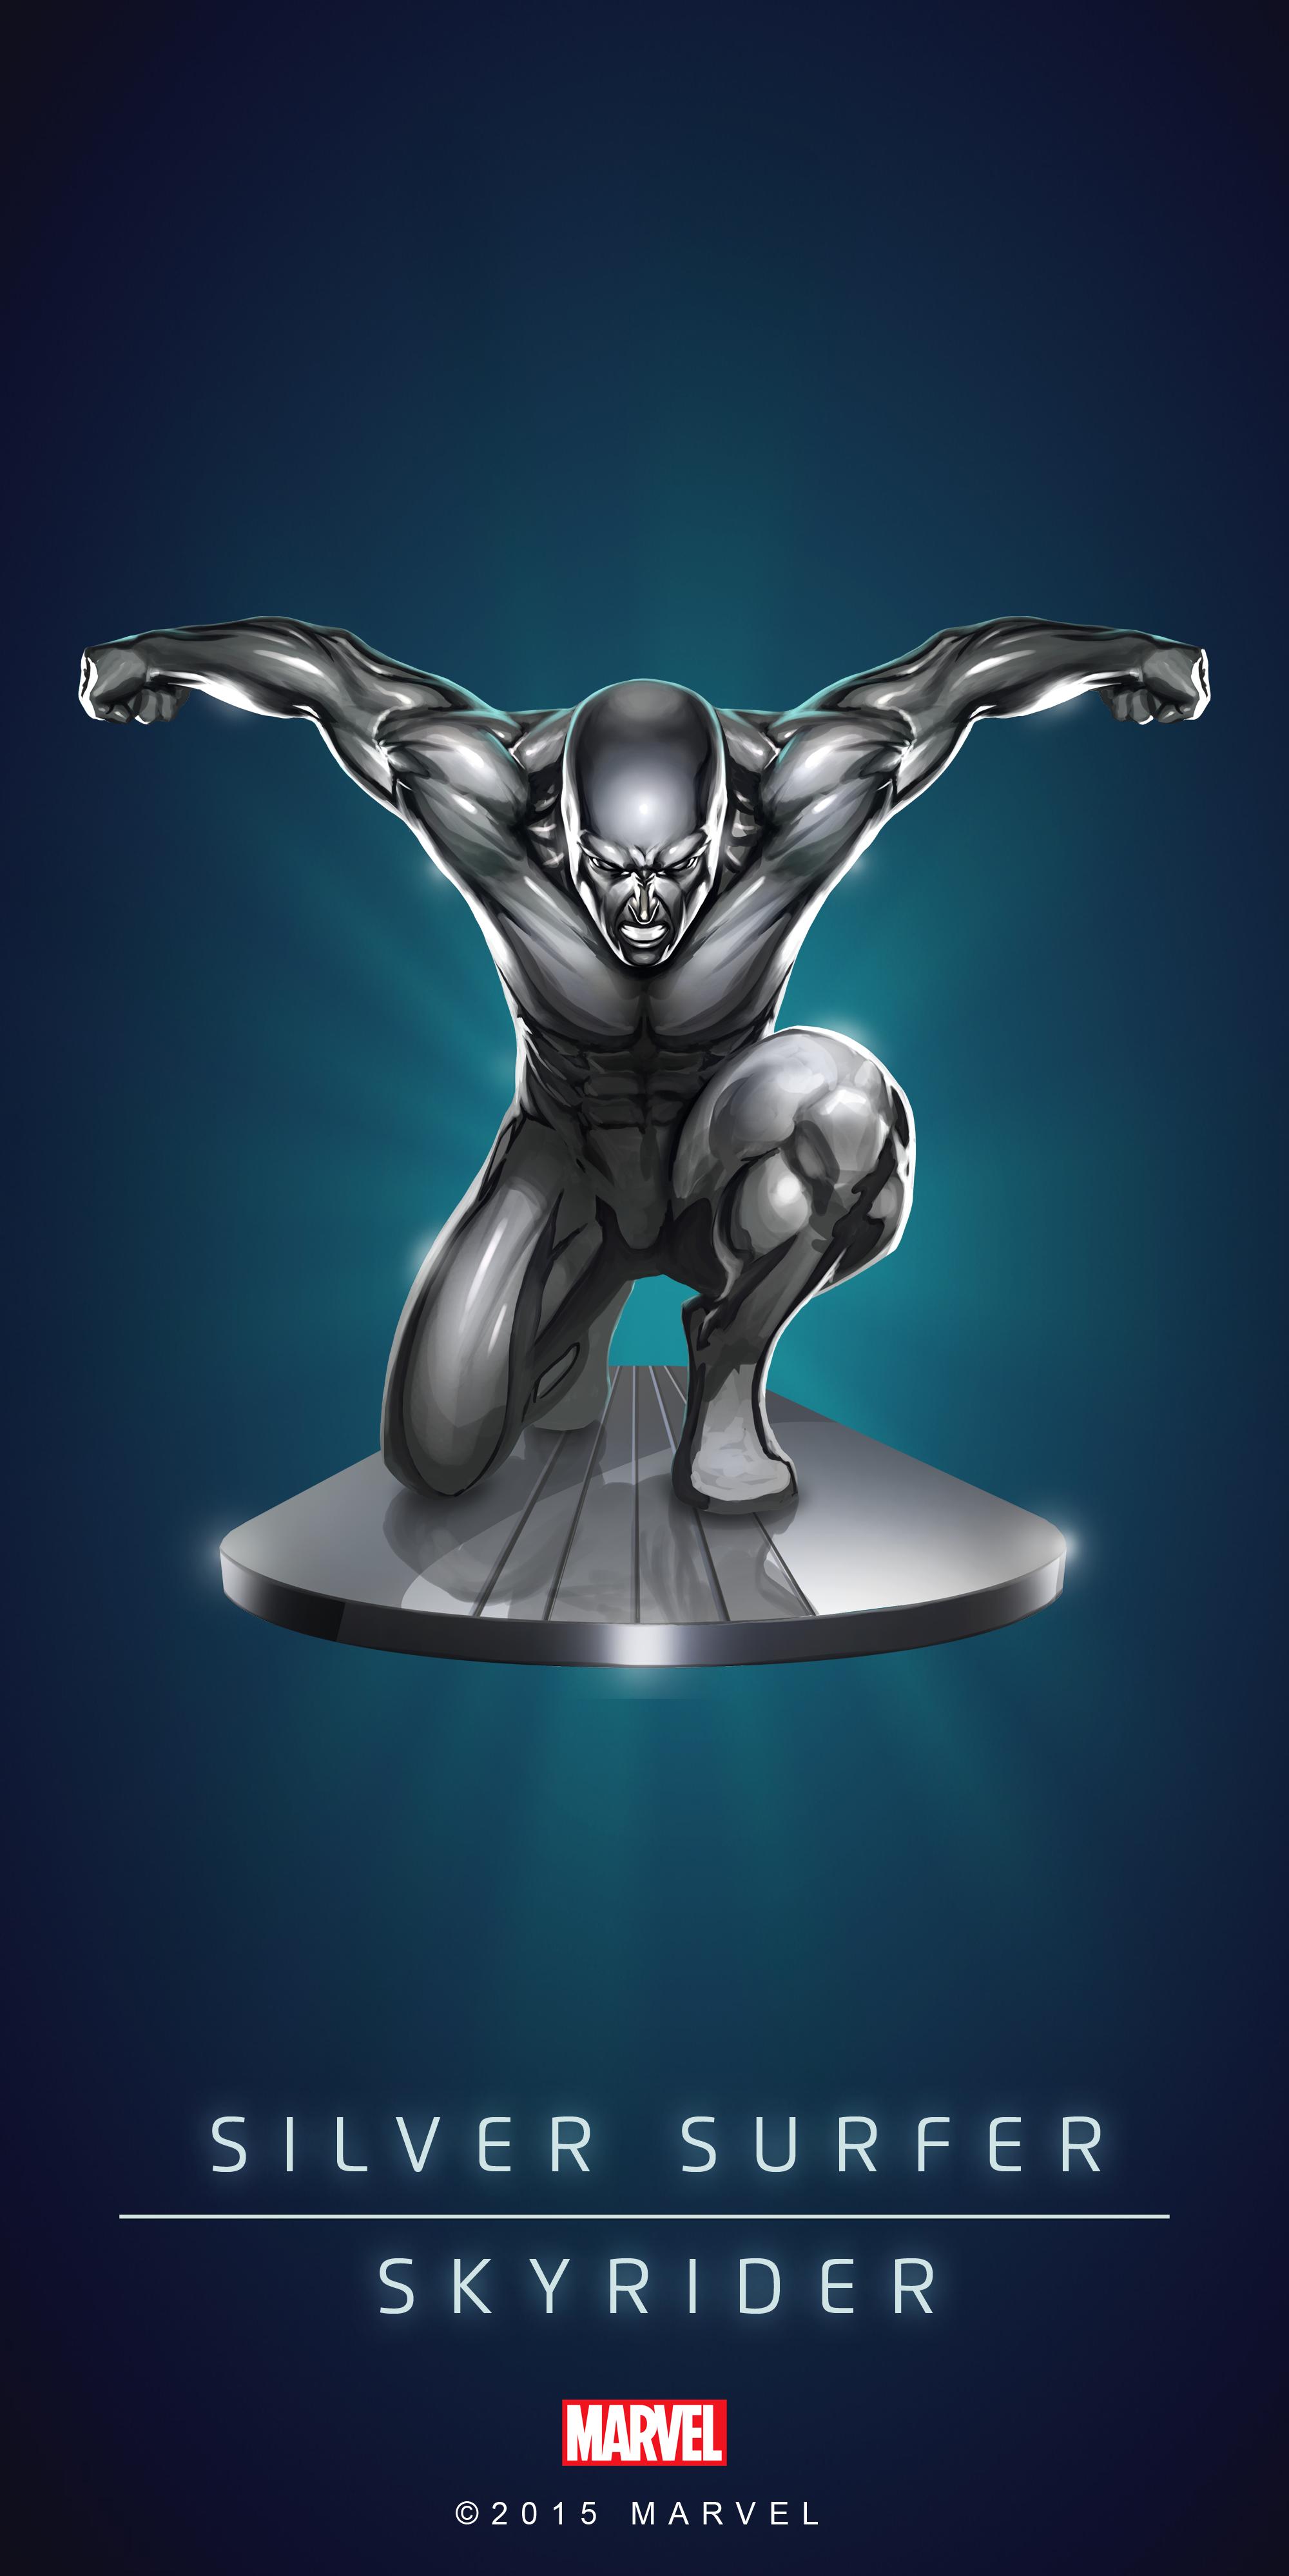 Silver Surfer Superhero Poster Fan T Shirt